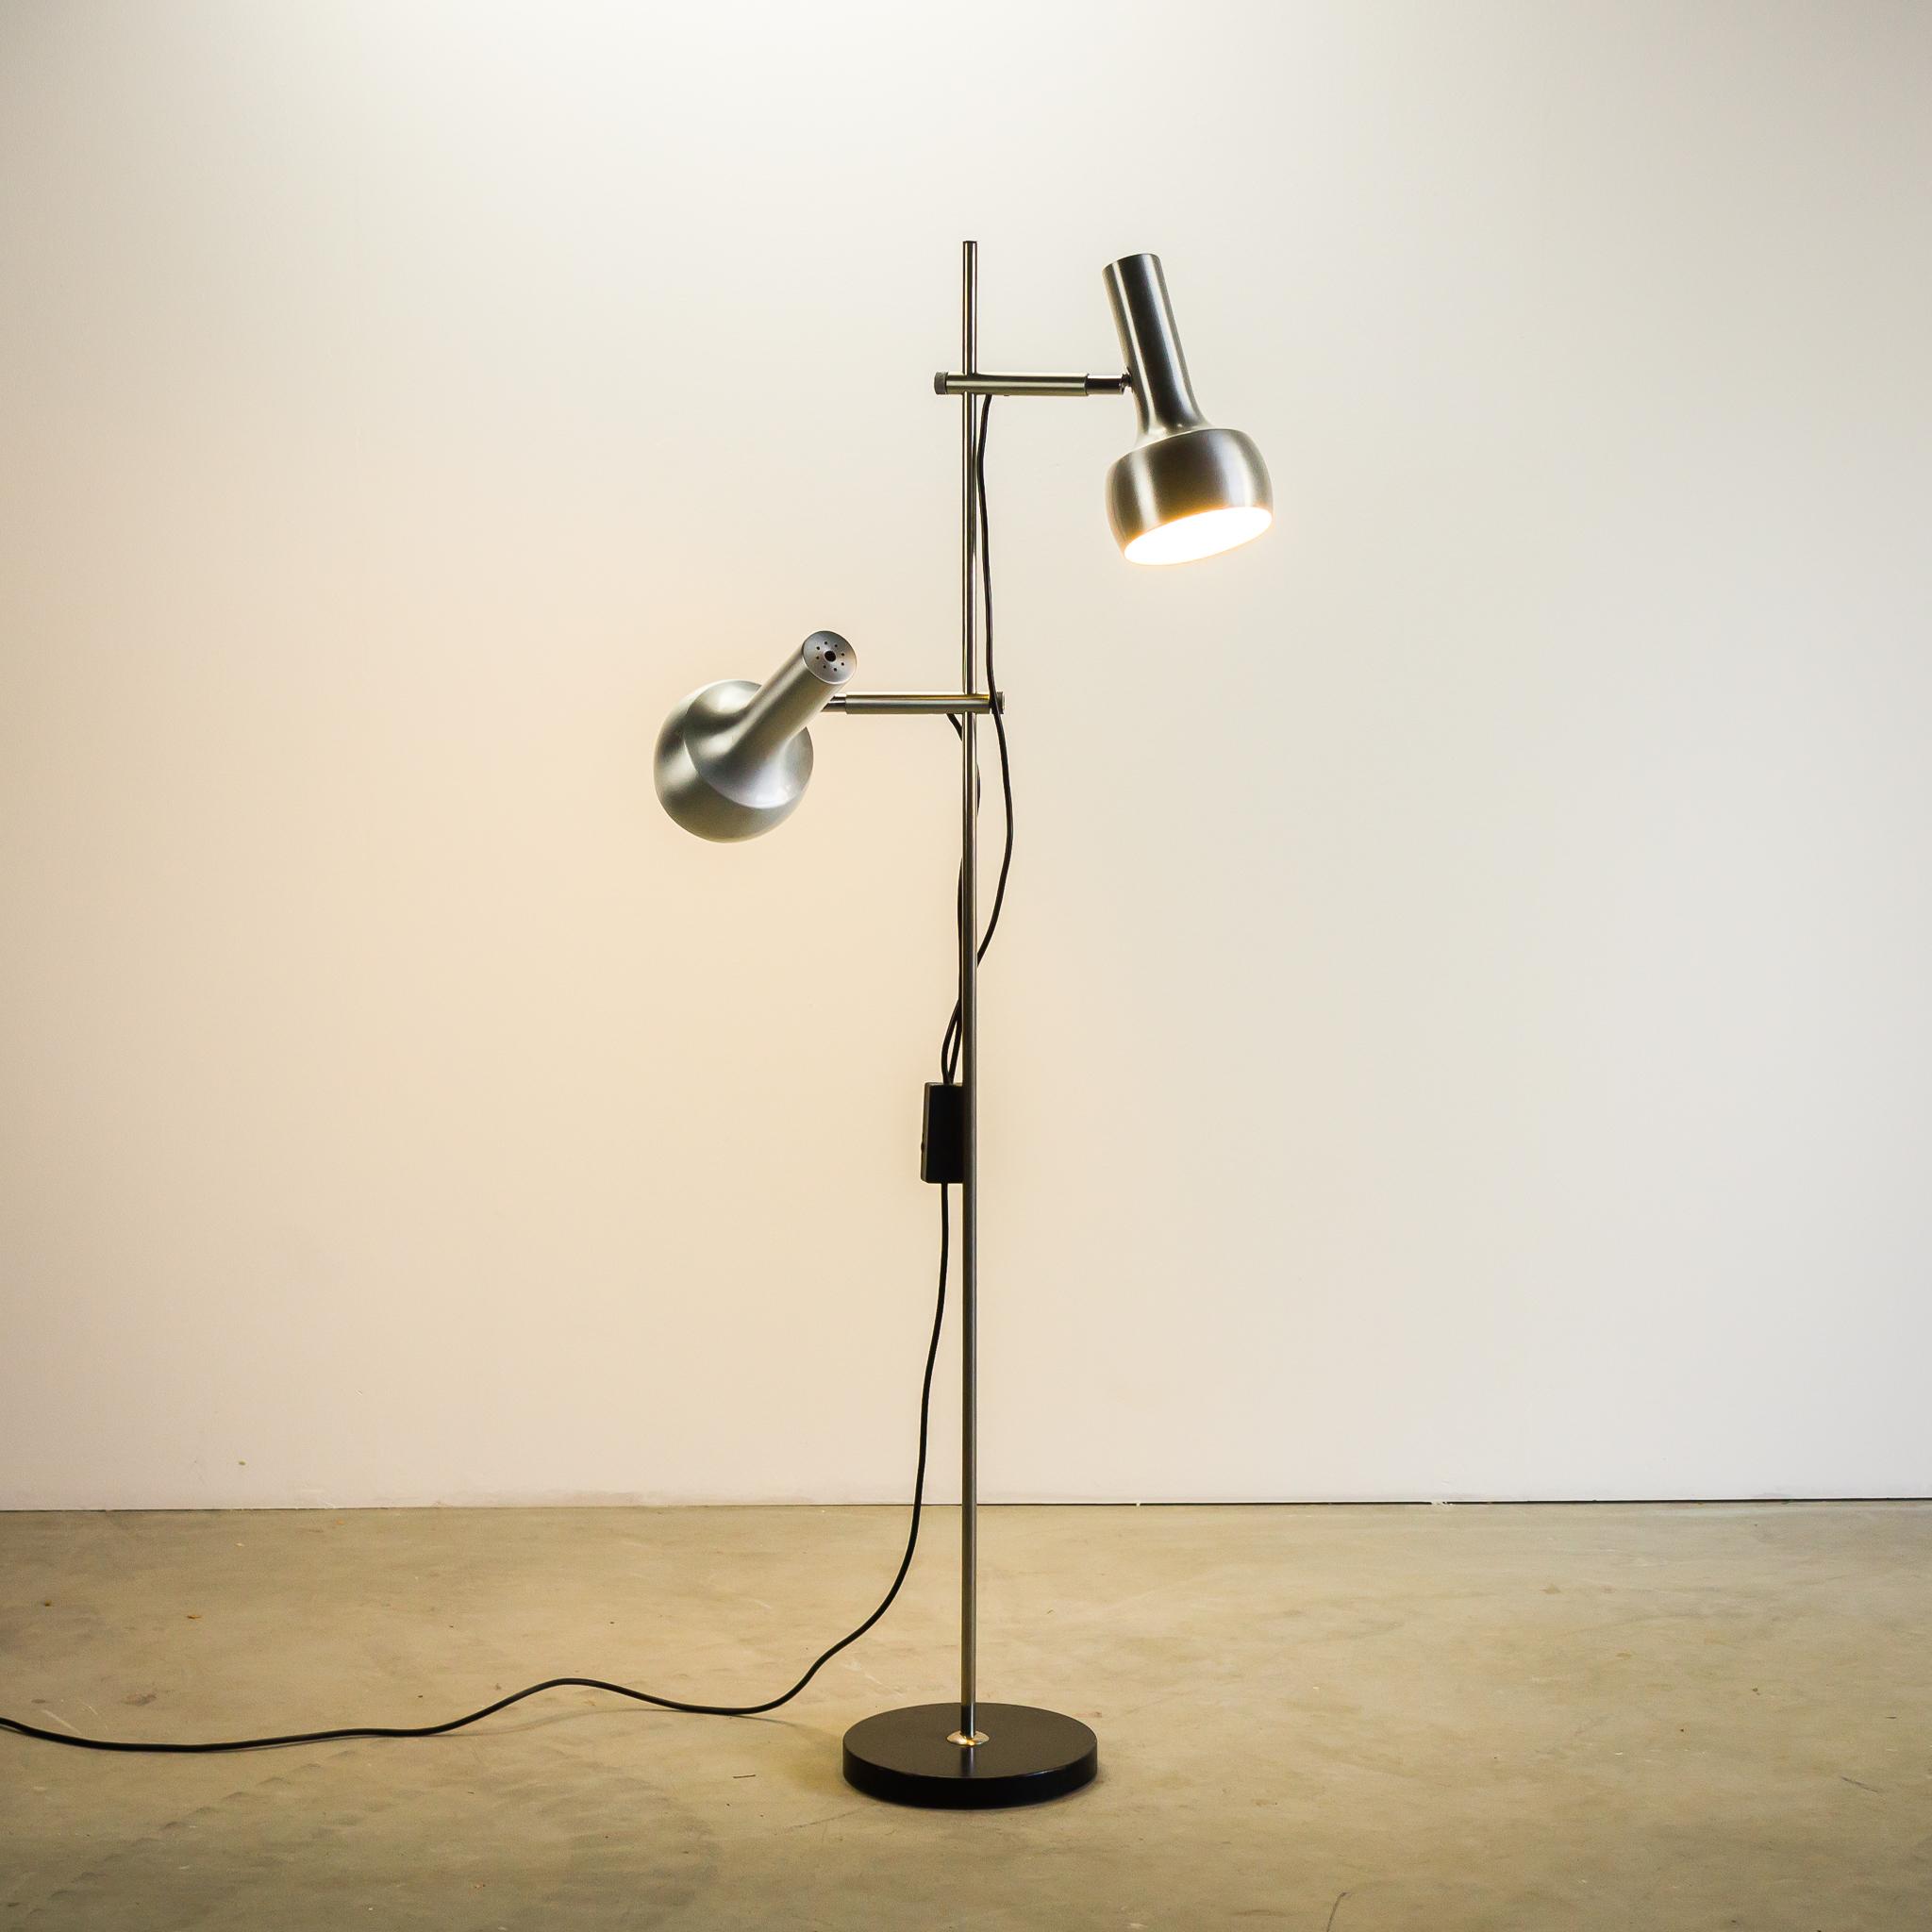 70 s vloerlamp chroom aluminium met 2 lampen barbmama. Black Bedroom Furniture Sets. Home Design Ideas